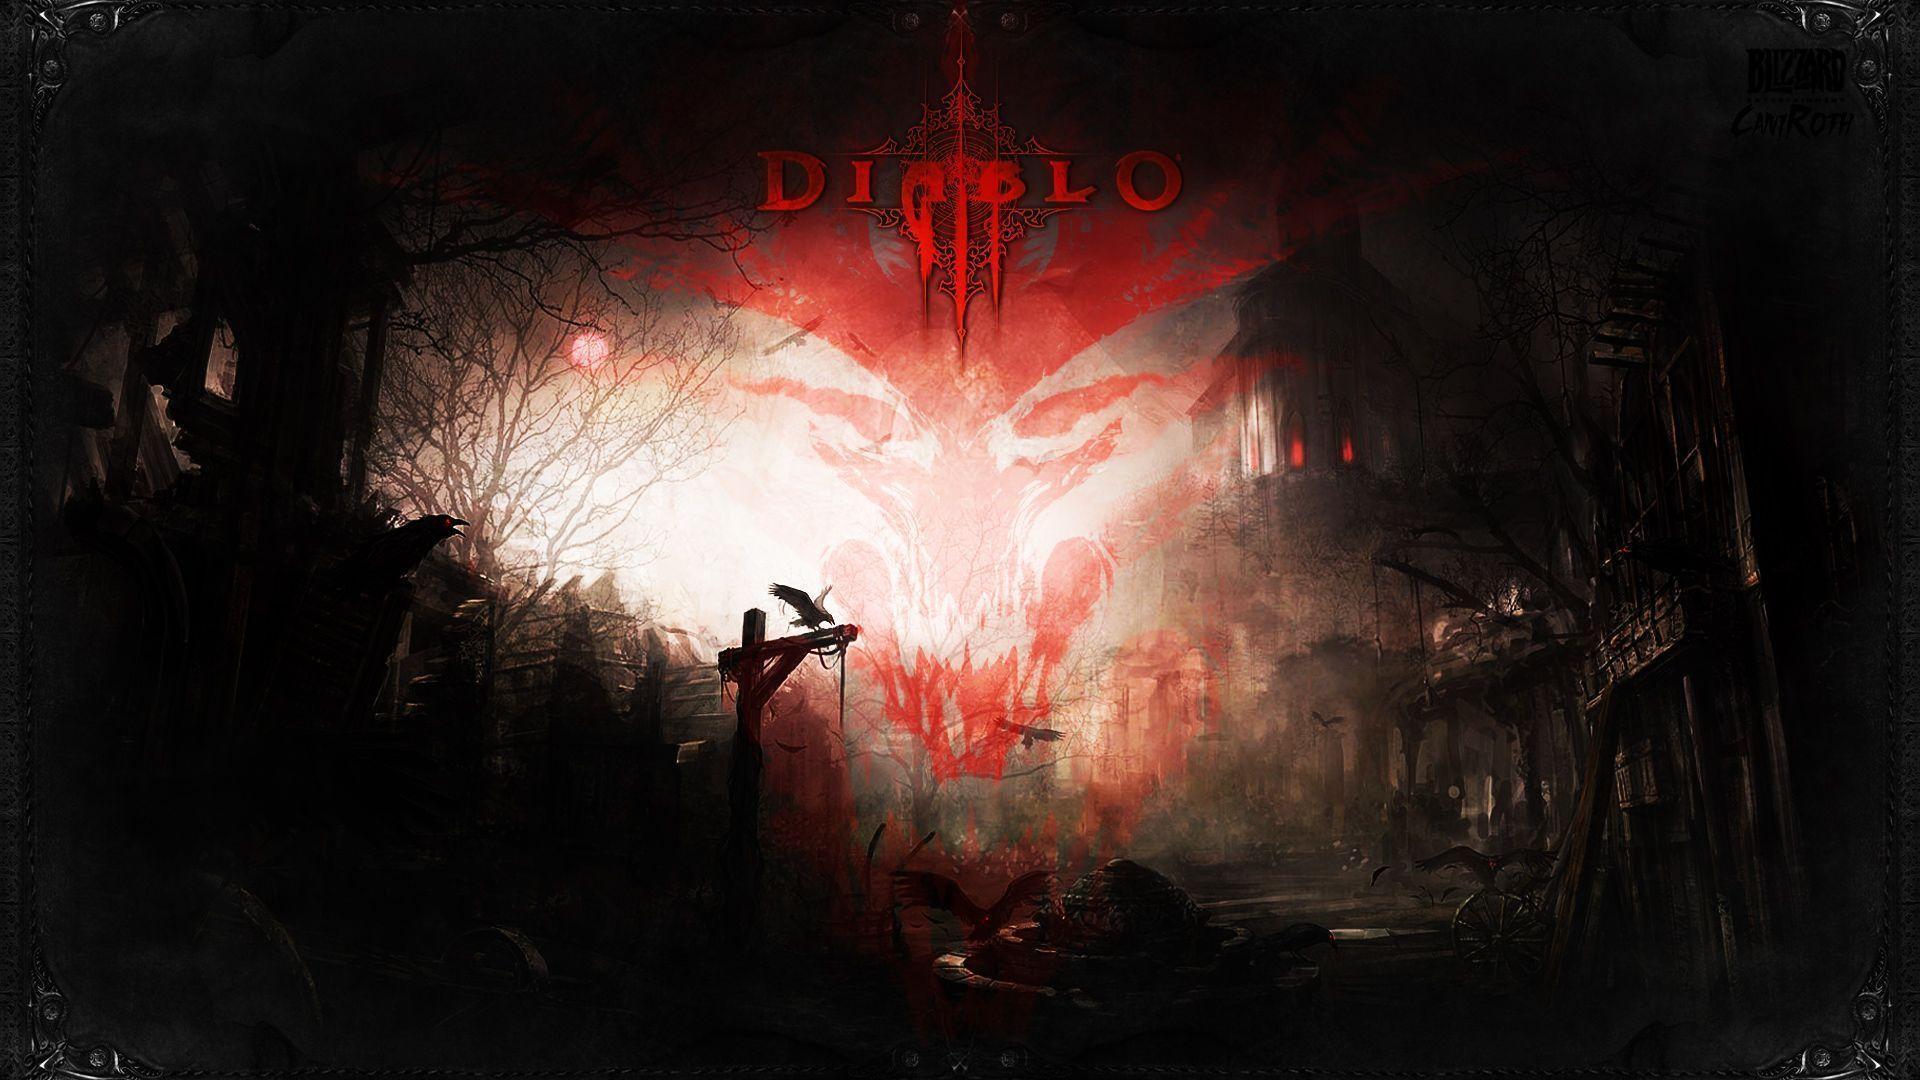 2012 Diablo 3 Shadow over Tristram Wallpapers - HD Wallpapers 98148